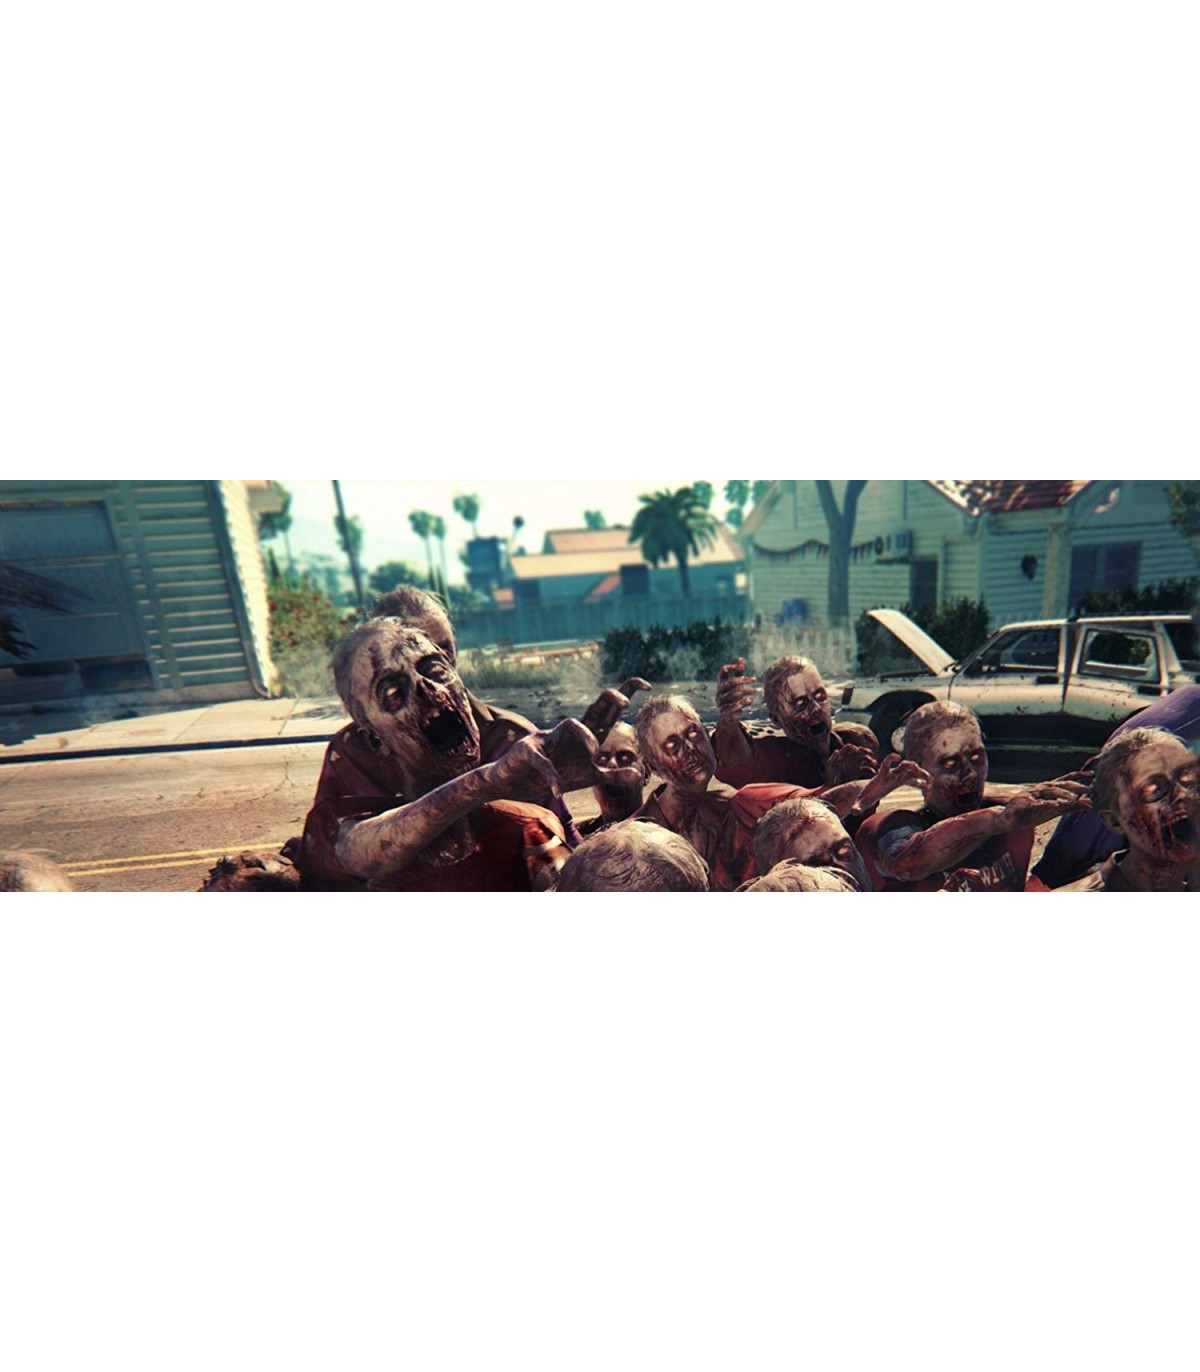 بازی Dead Island Definitive Collection - پلی استیشن 4